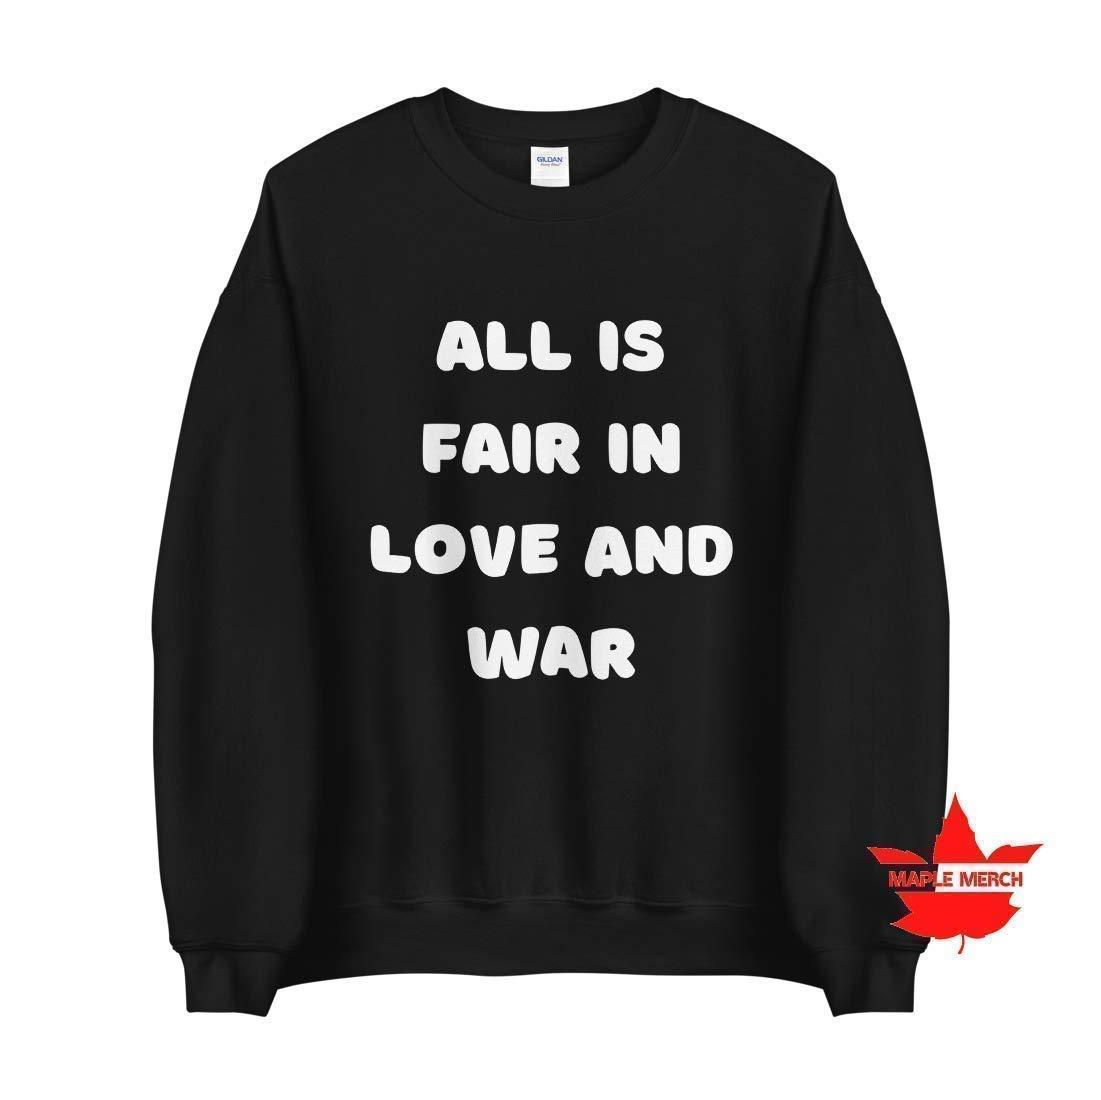 All is Fair Oakland Mall In Love Washington Mall and Sweatshi Bridgerton Crewneck War Sweater